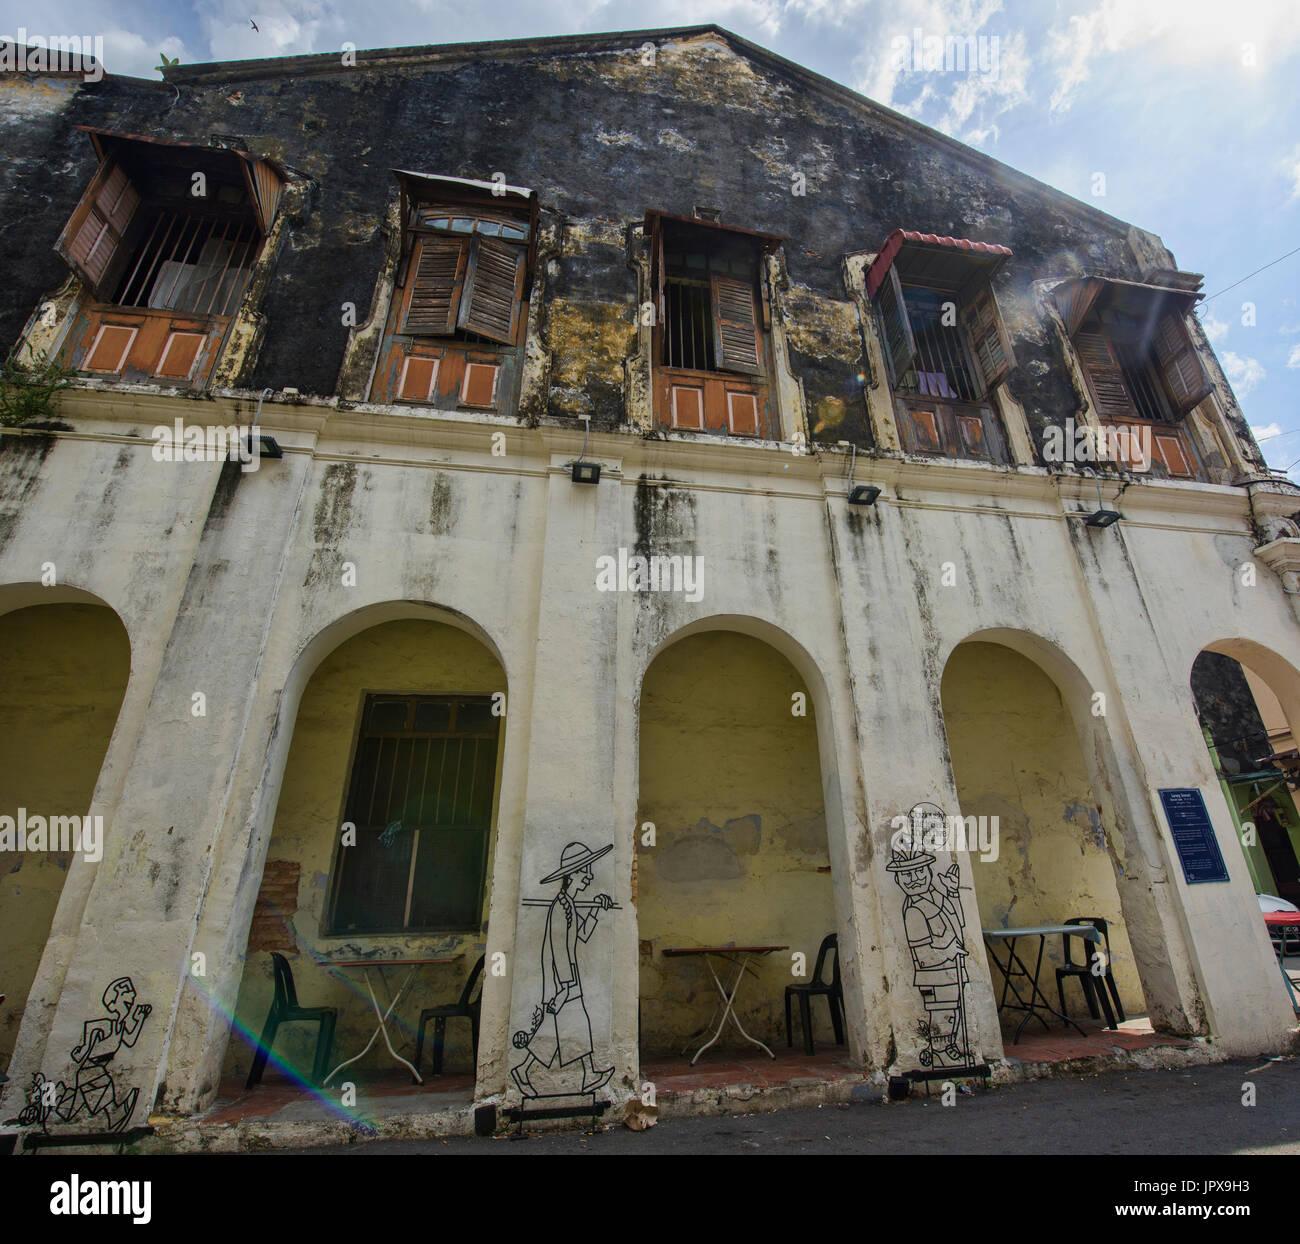 World Heritage Penang Stock Photos & World Heritage Penang